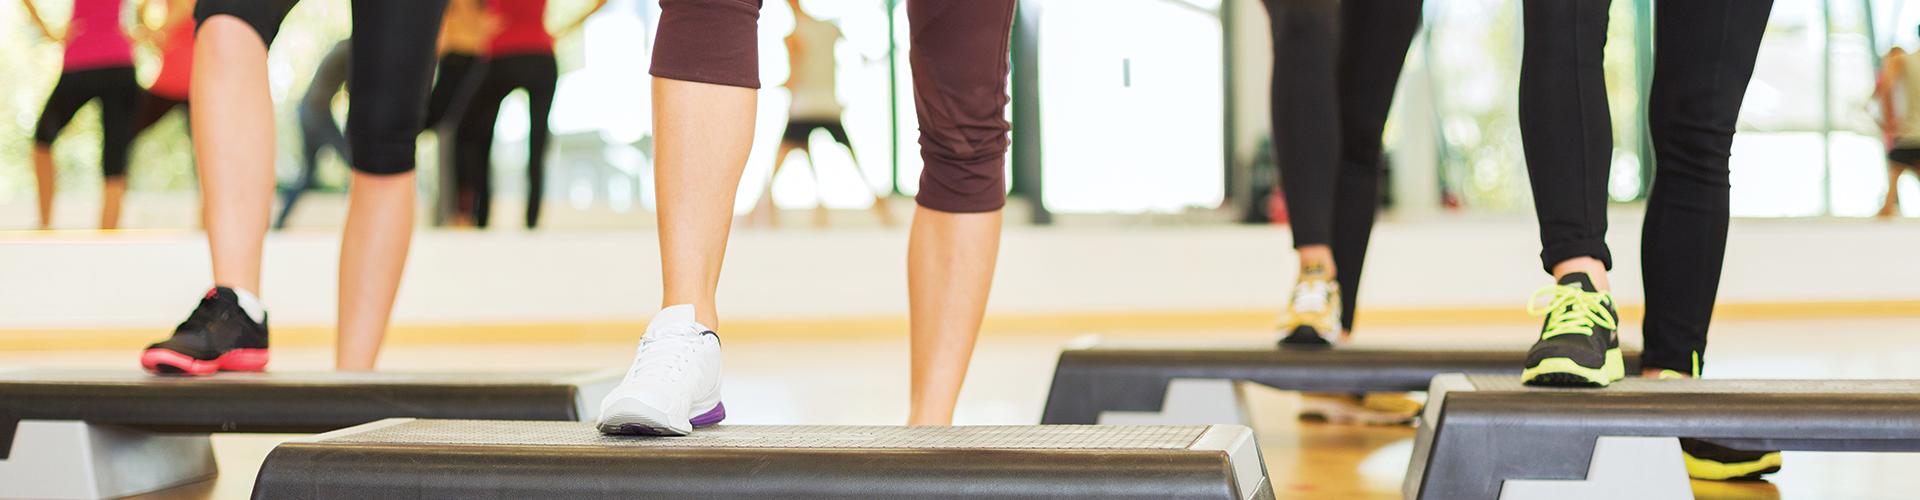 slider-group-fitness-challenge